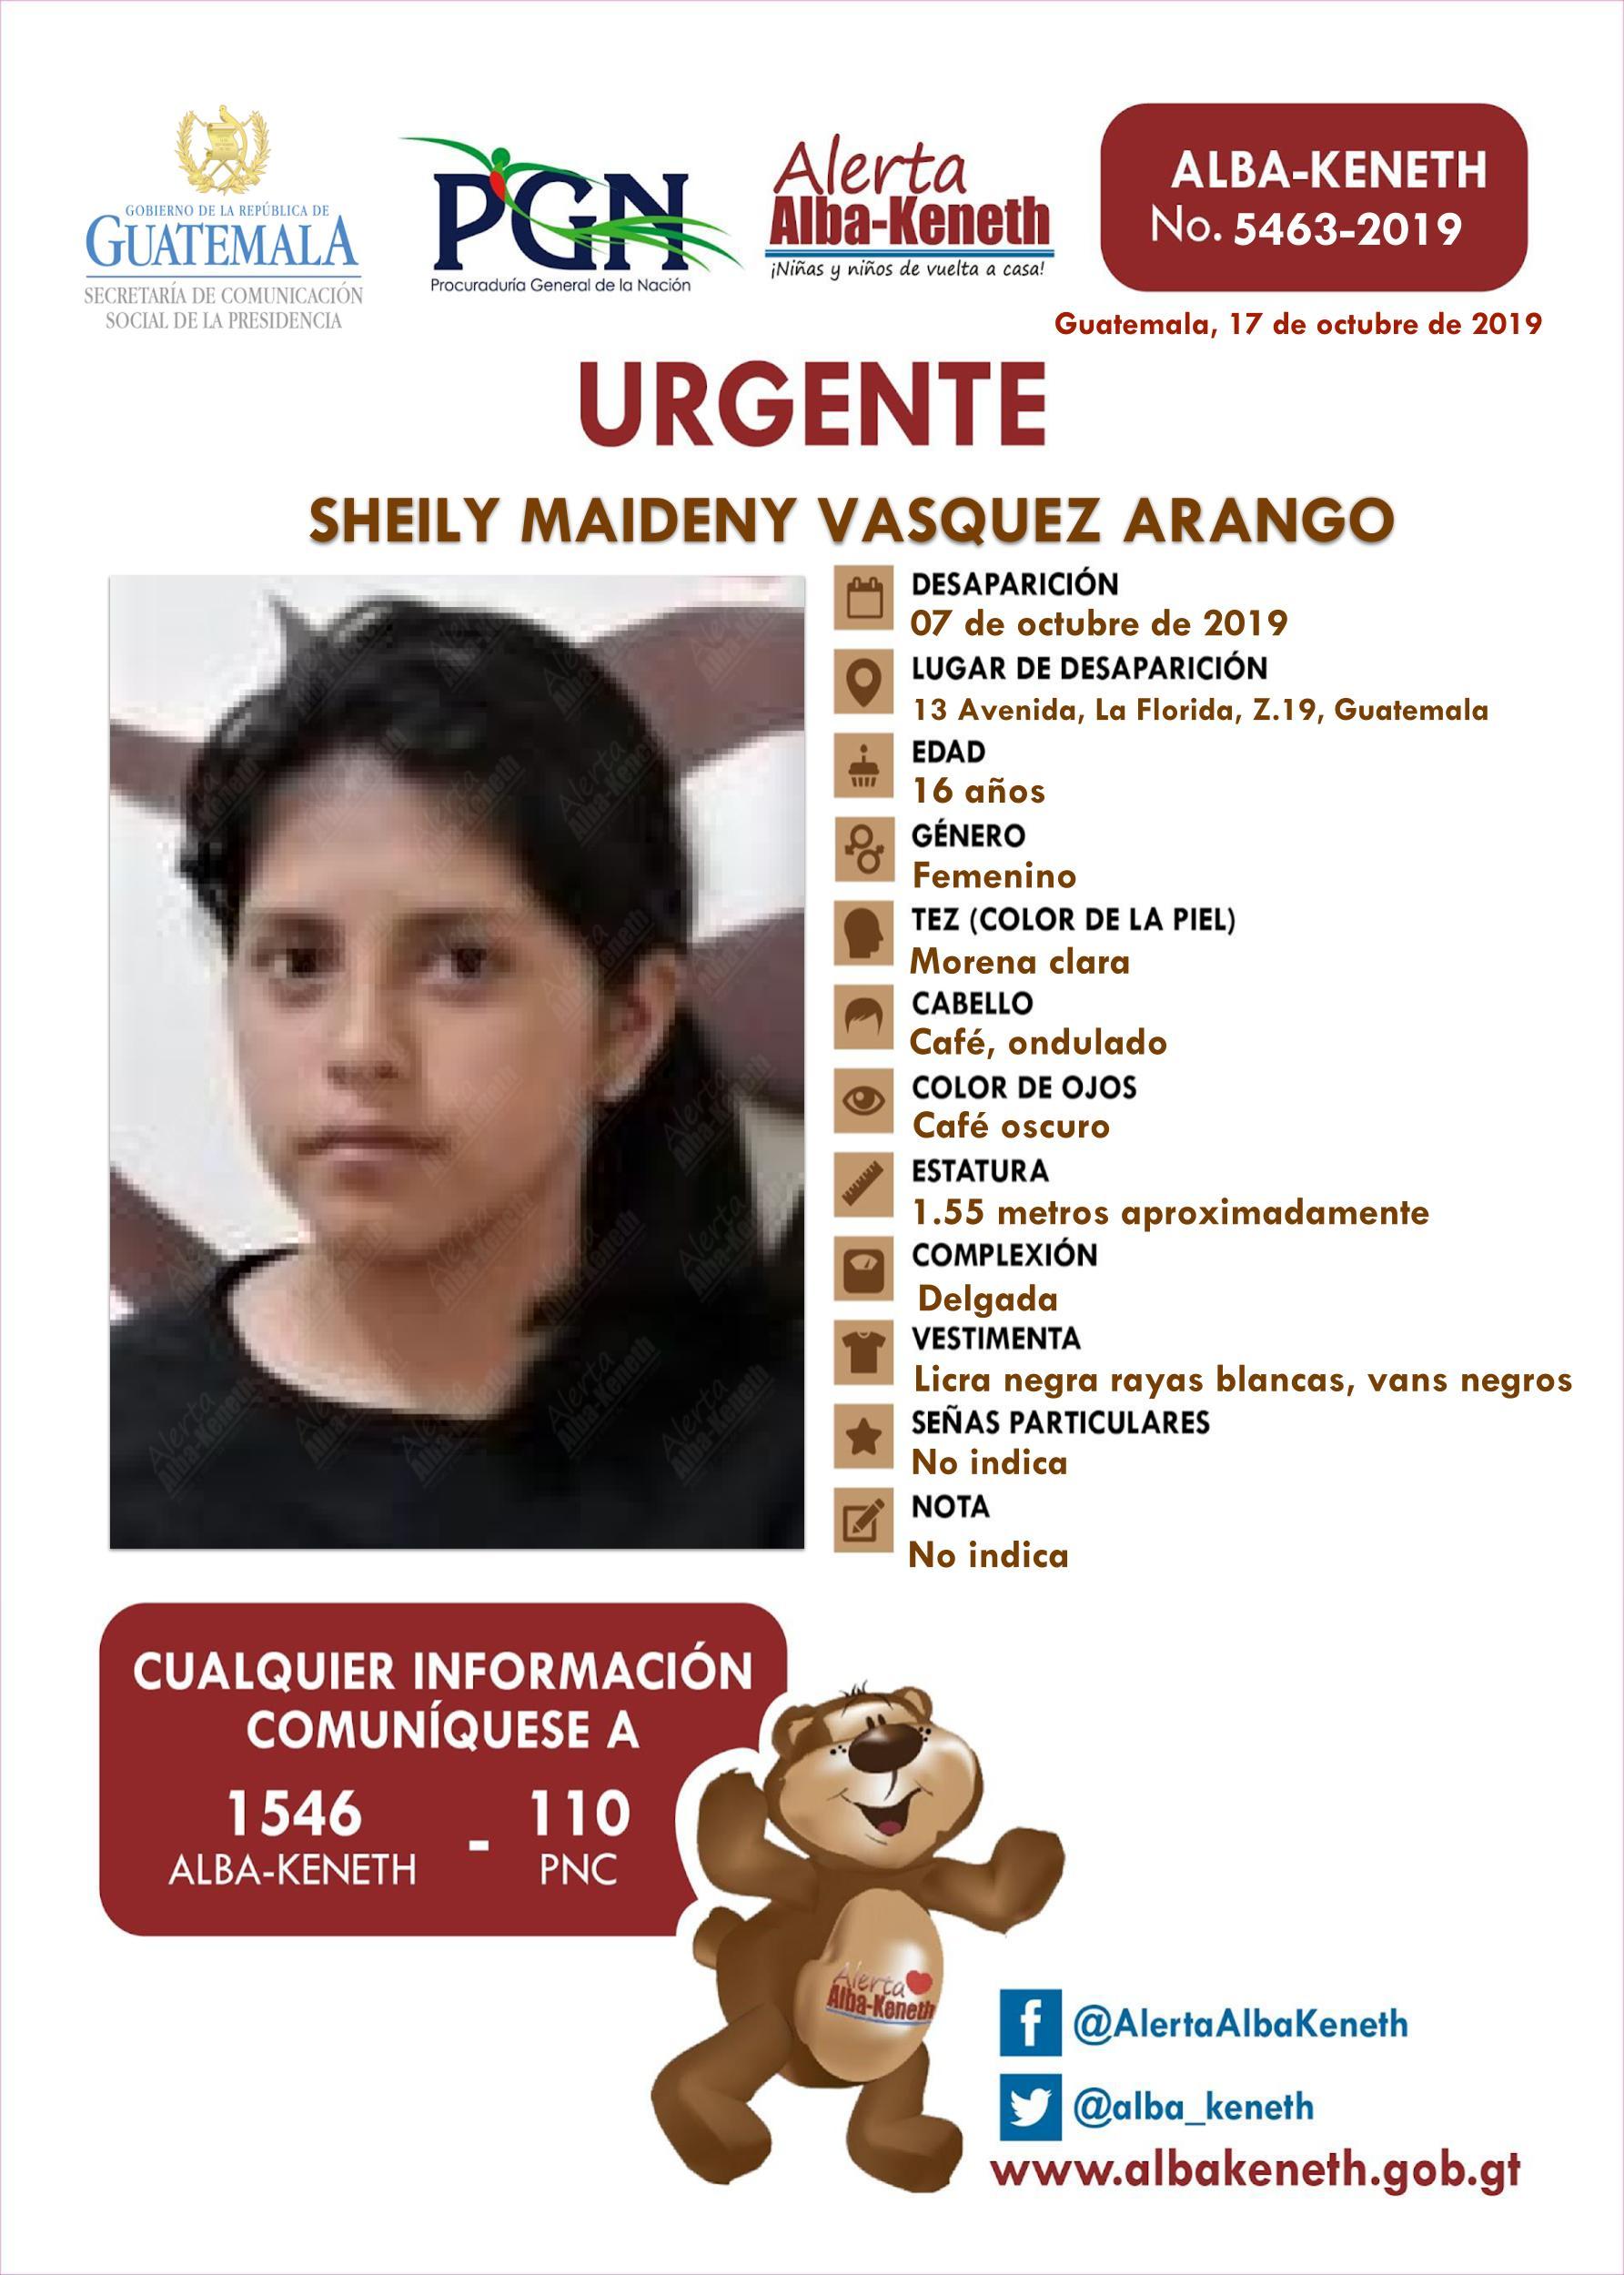 Sheily Maideny Vasquez Arango